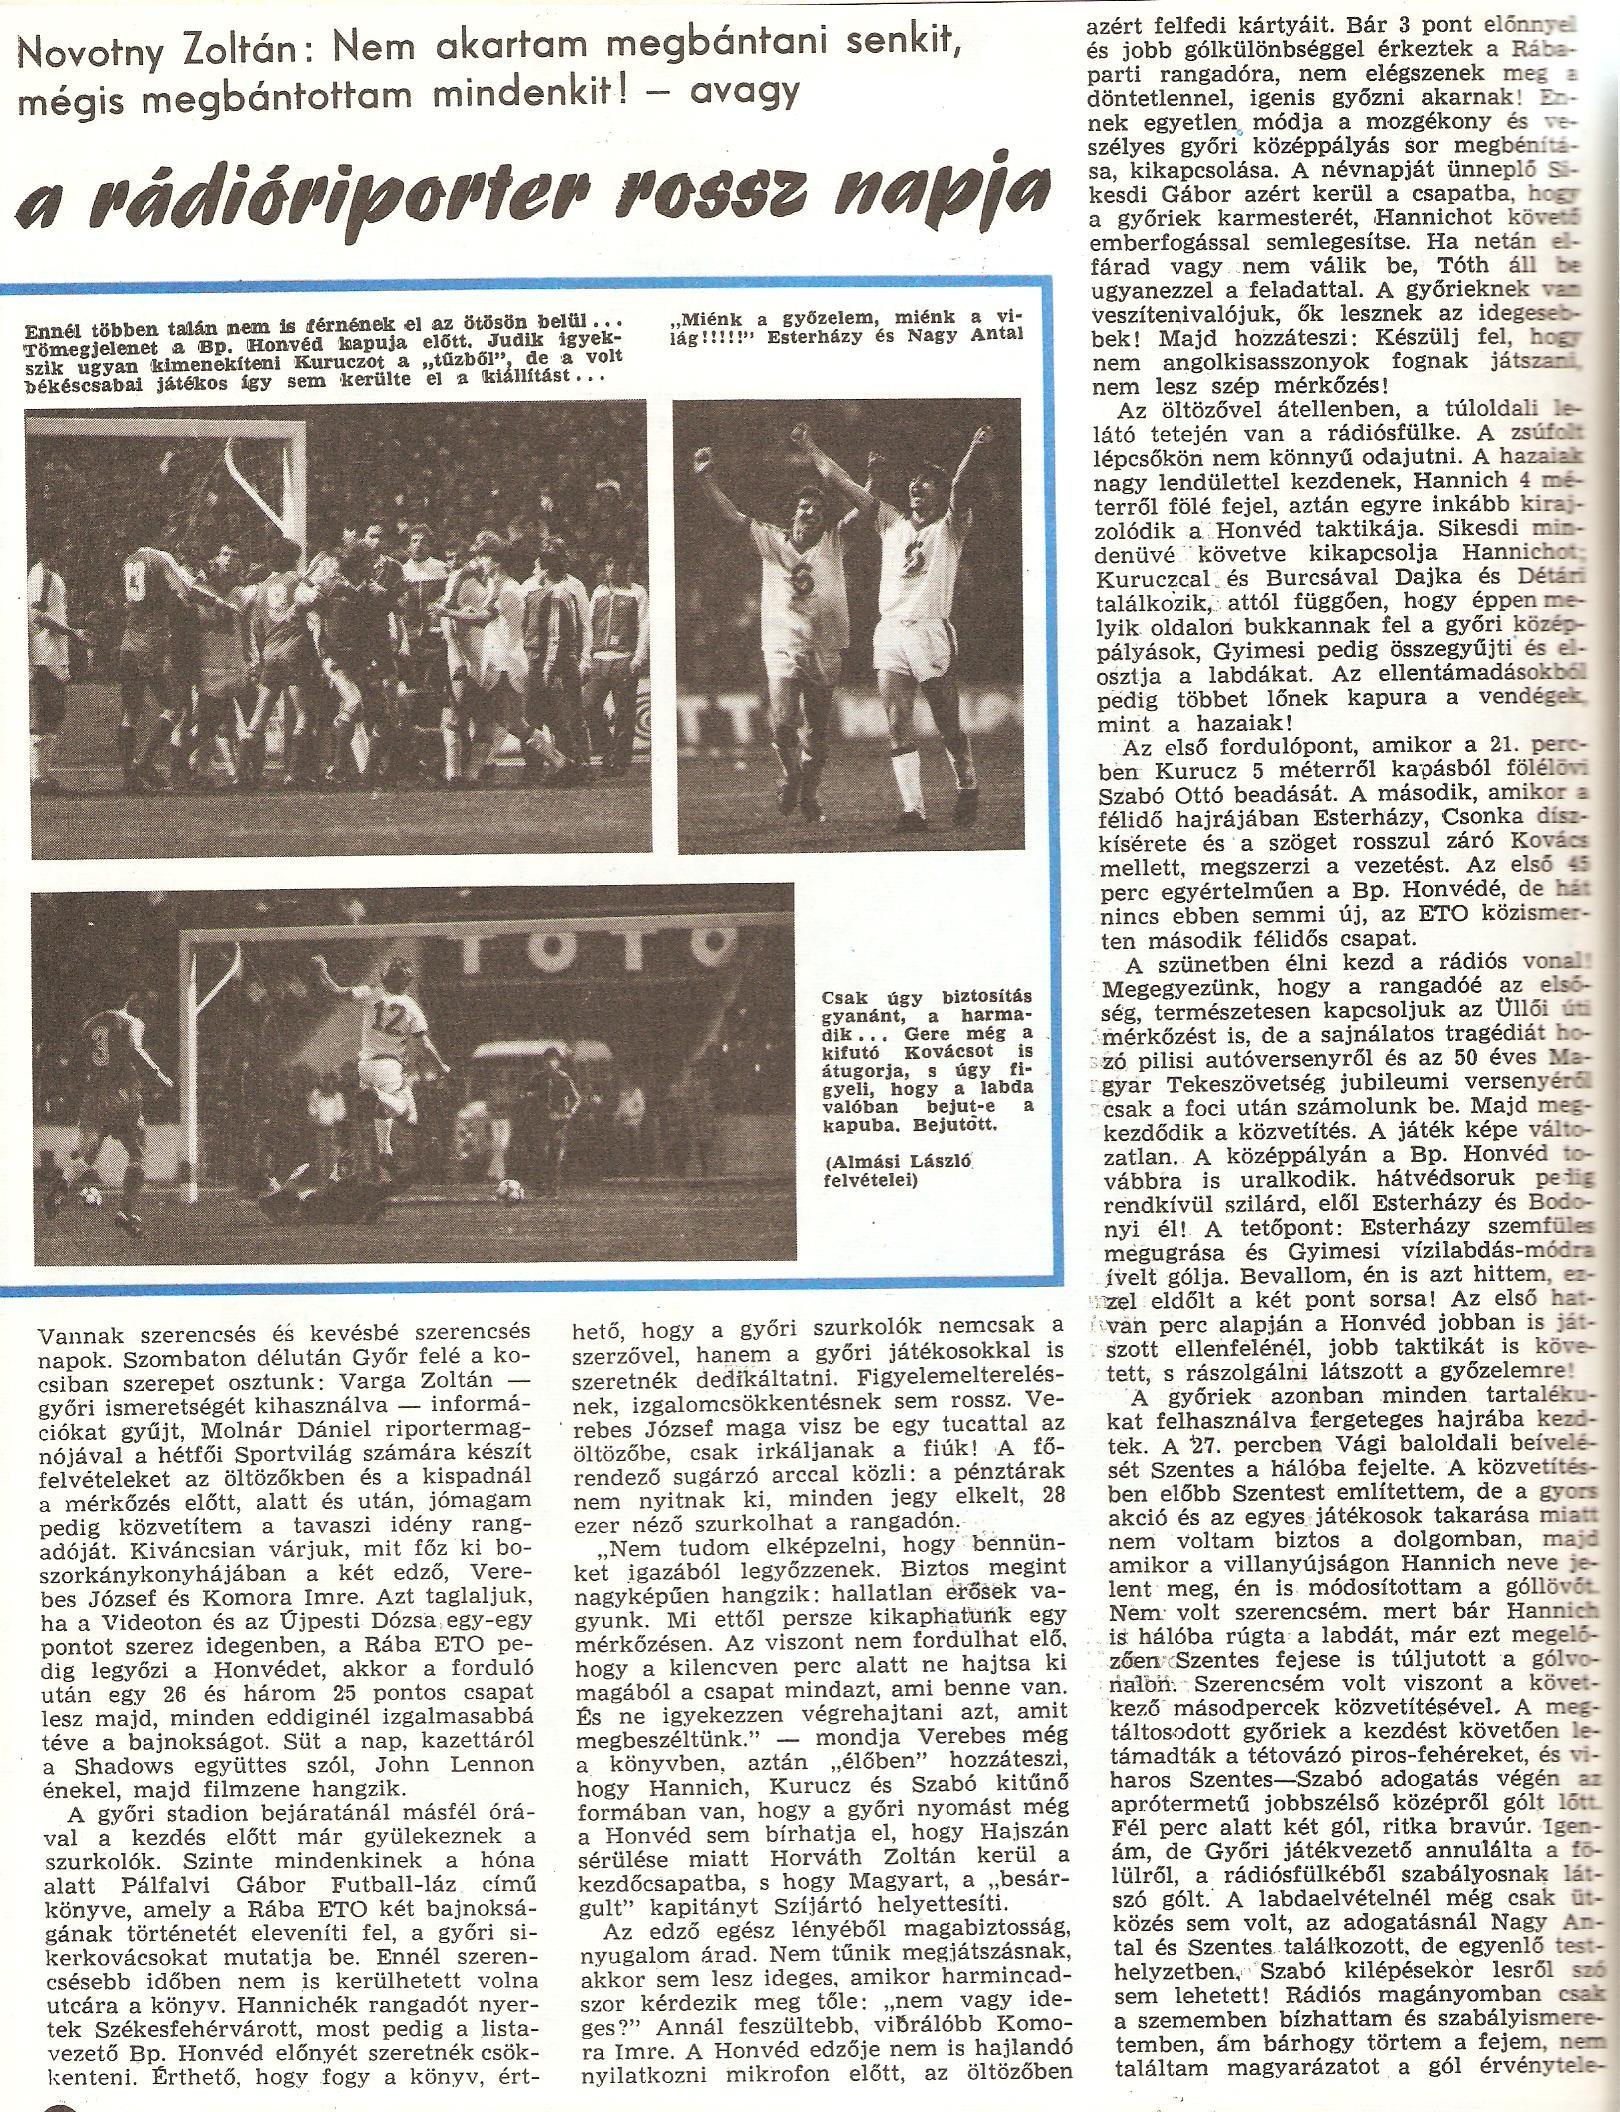 Idokapszula_nb1_1983-84_19_fordulo_Raba_Honved3.jpg